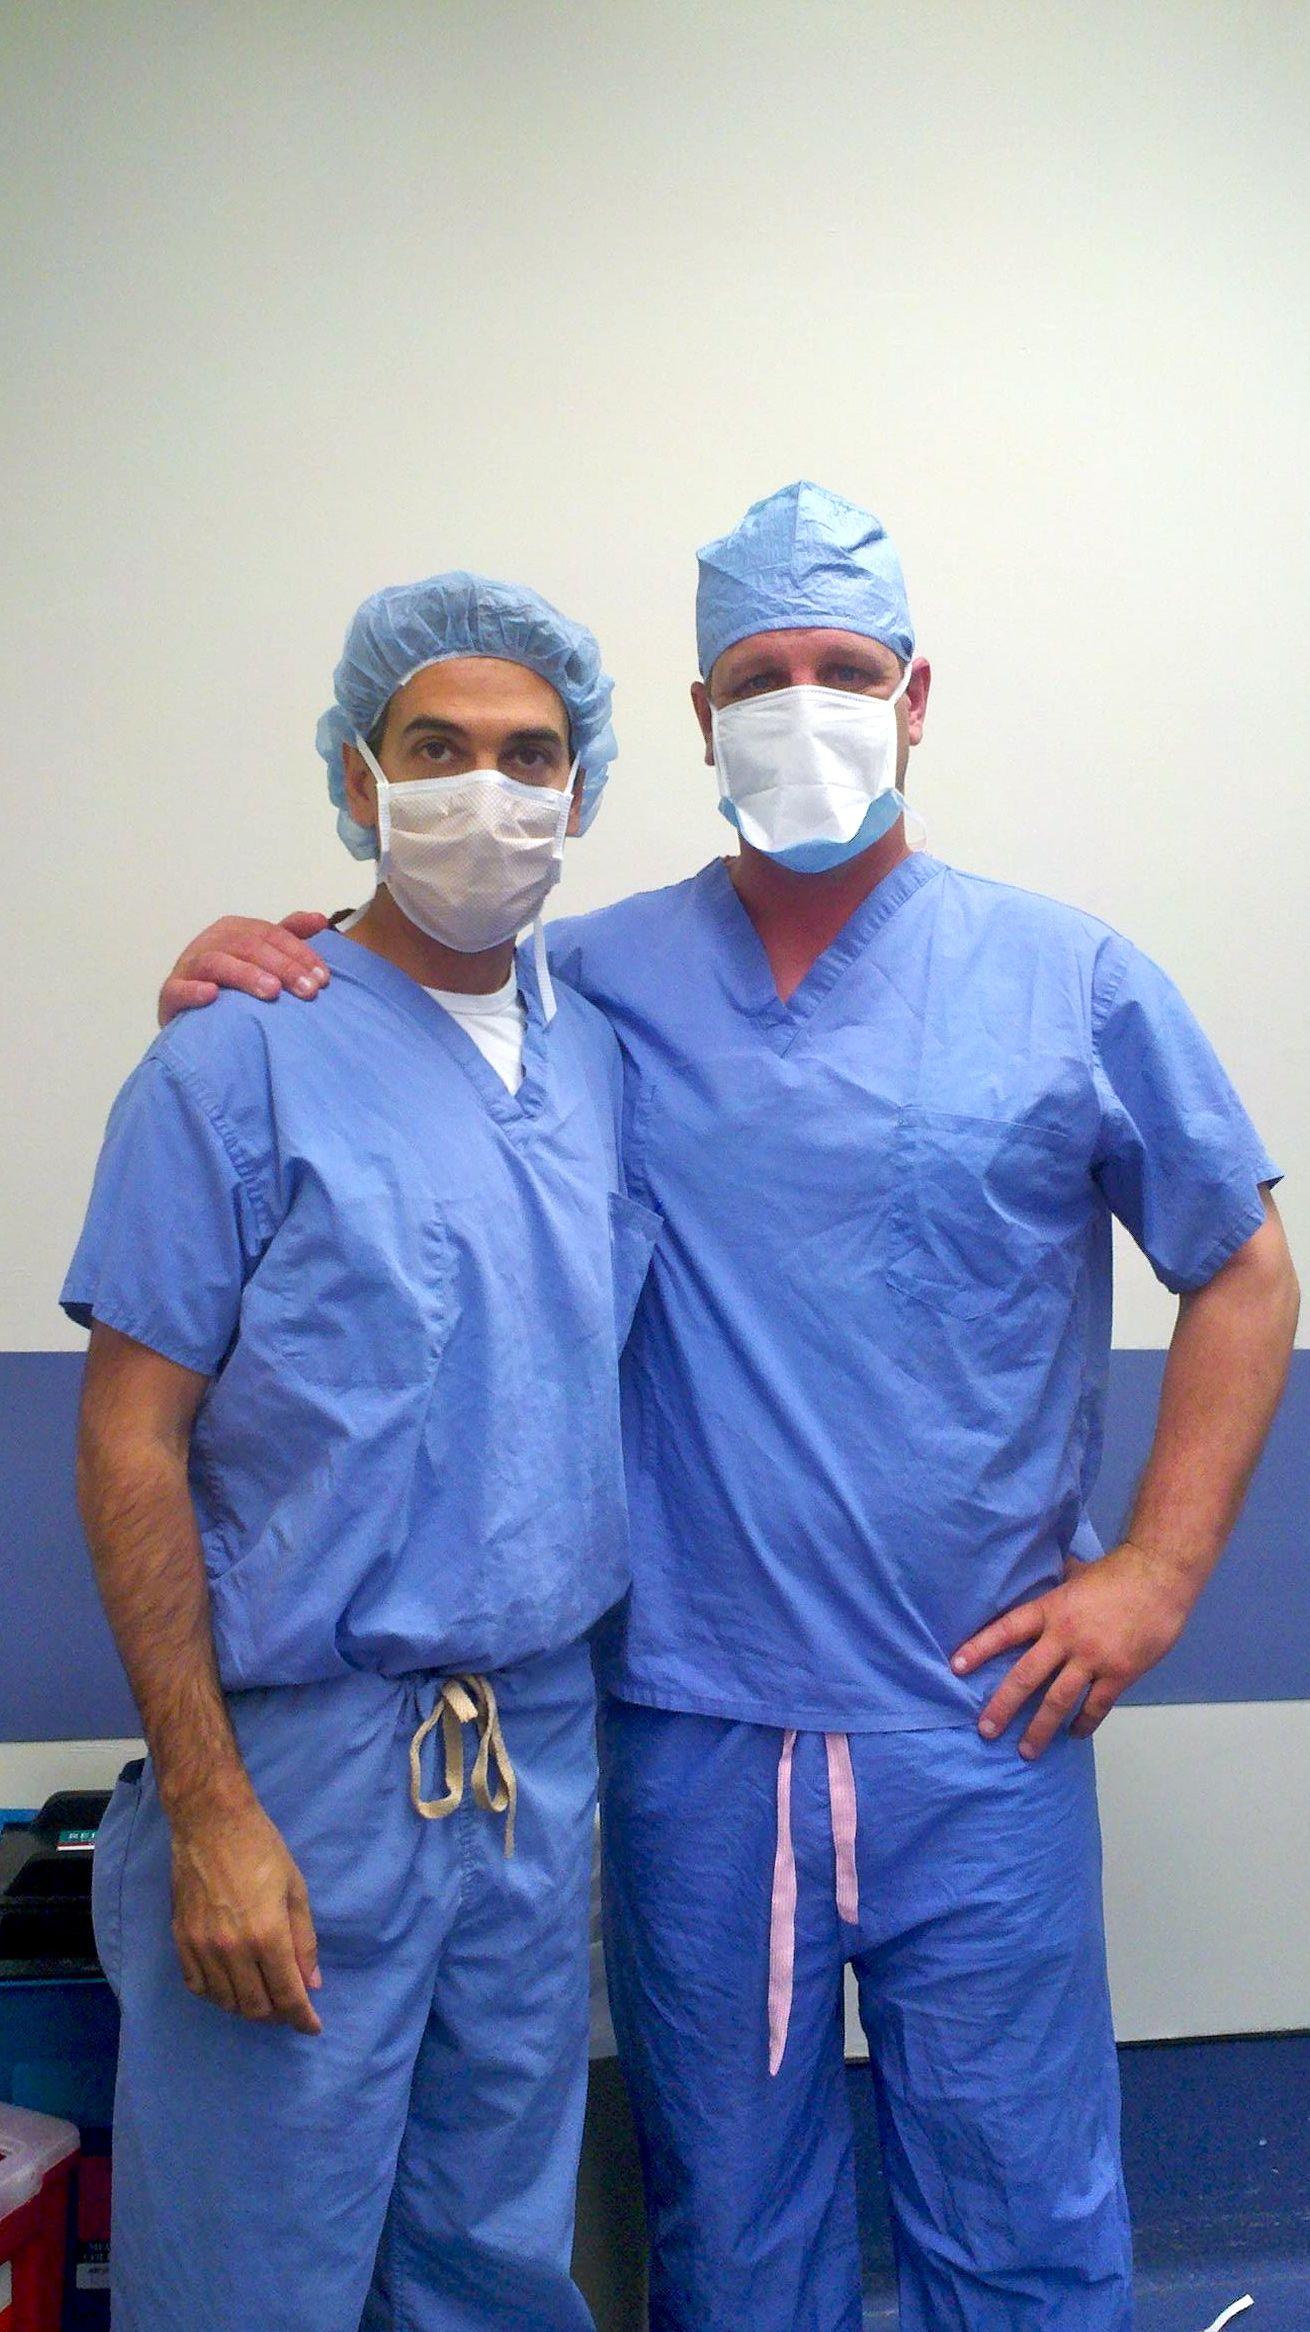 BHN Founder Steve Hayward with BHN Orthopedic Surgeon and